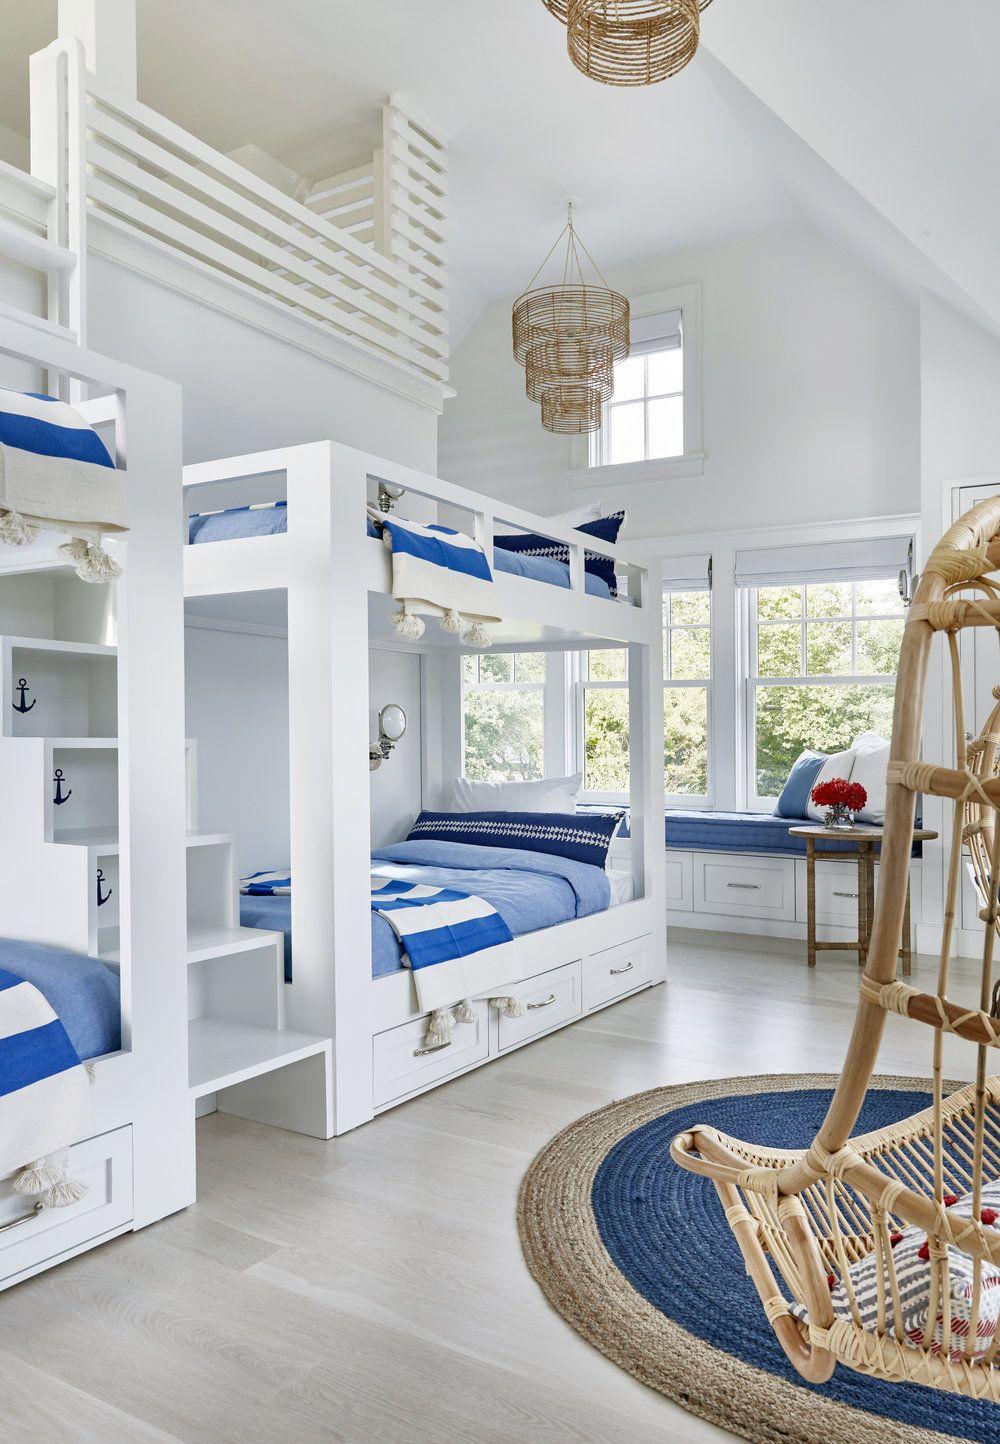 Cute Bunk Beds In A Coastal Kids Room